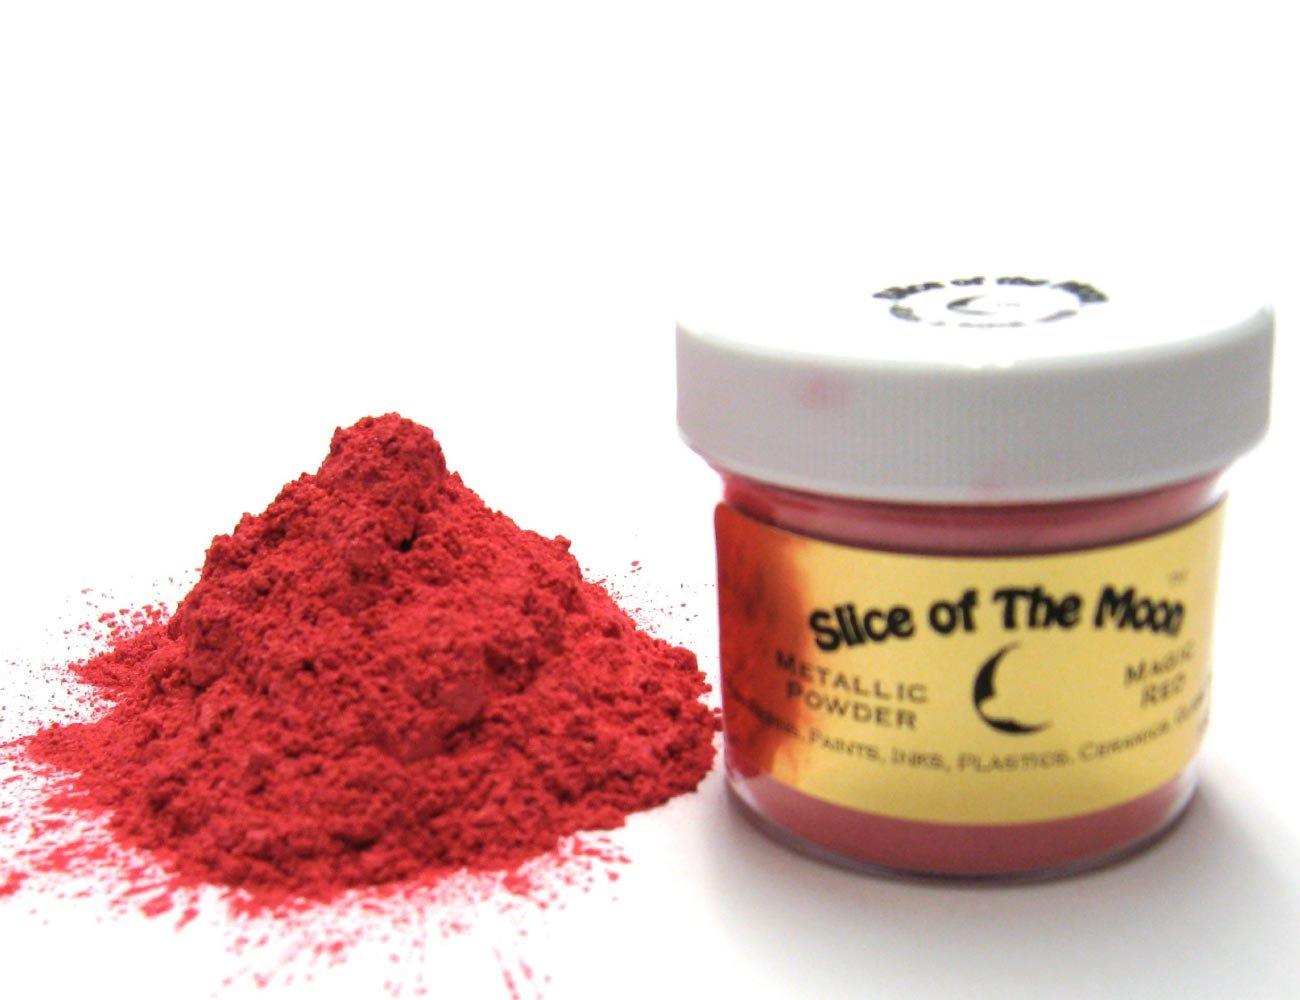 Magic Red Mica Powder 1oz, Metallic Pink Powder, Cosmetic Mica, Slice of the Moon